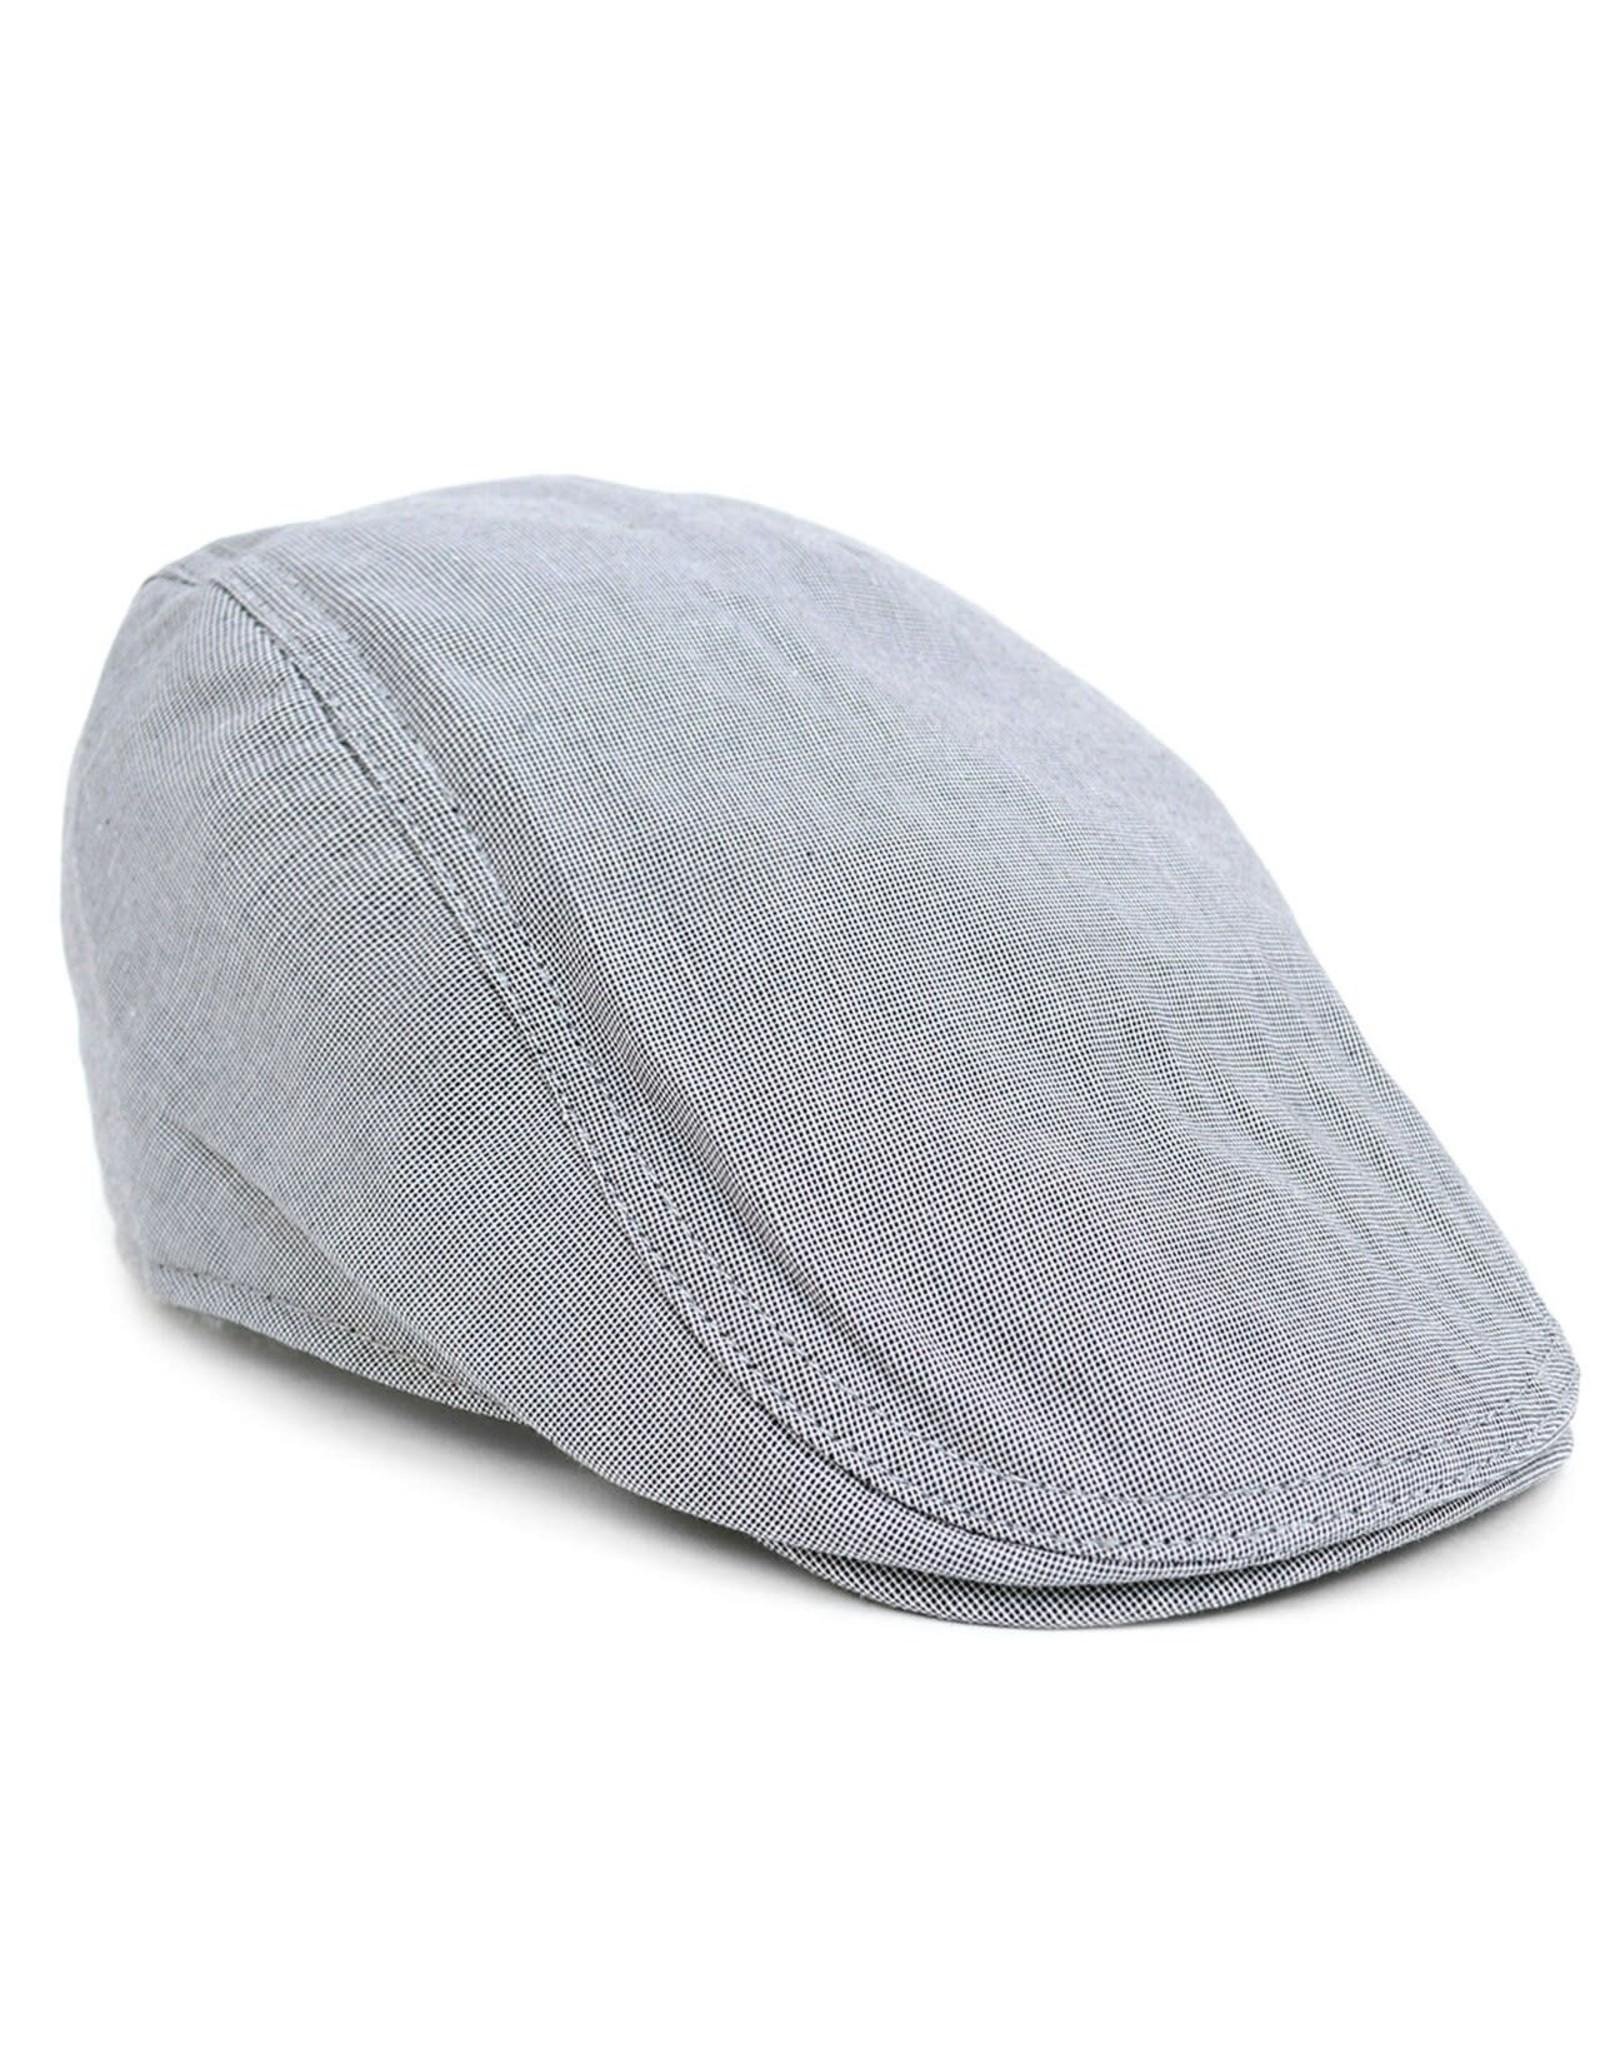 Selini New York Classic Crosshatch Patterned Hat